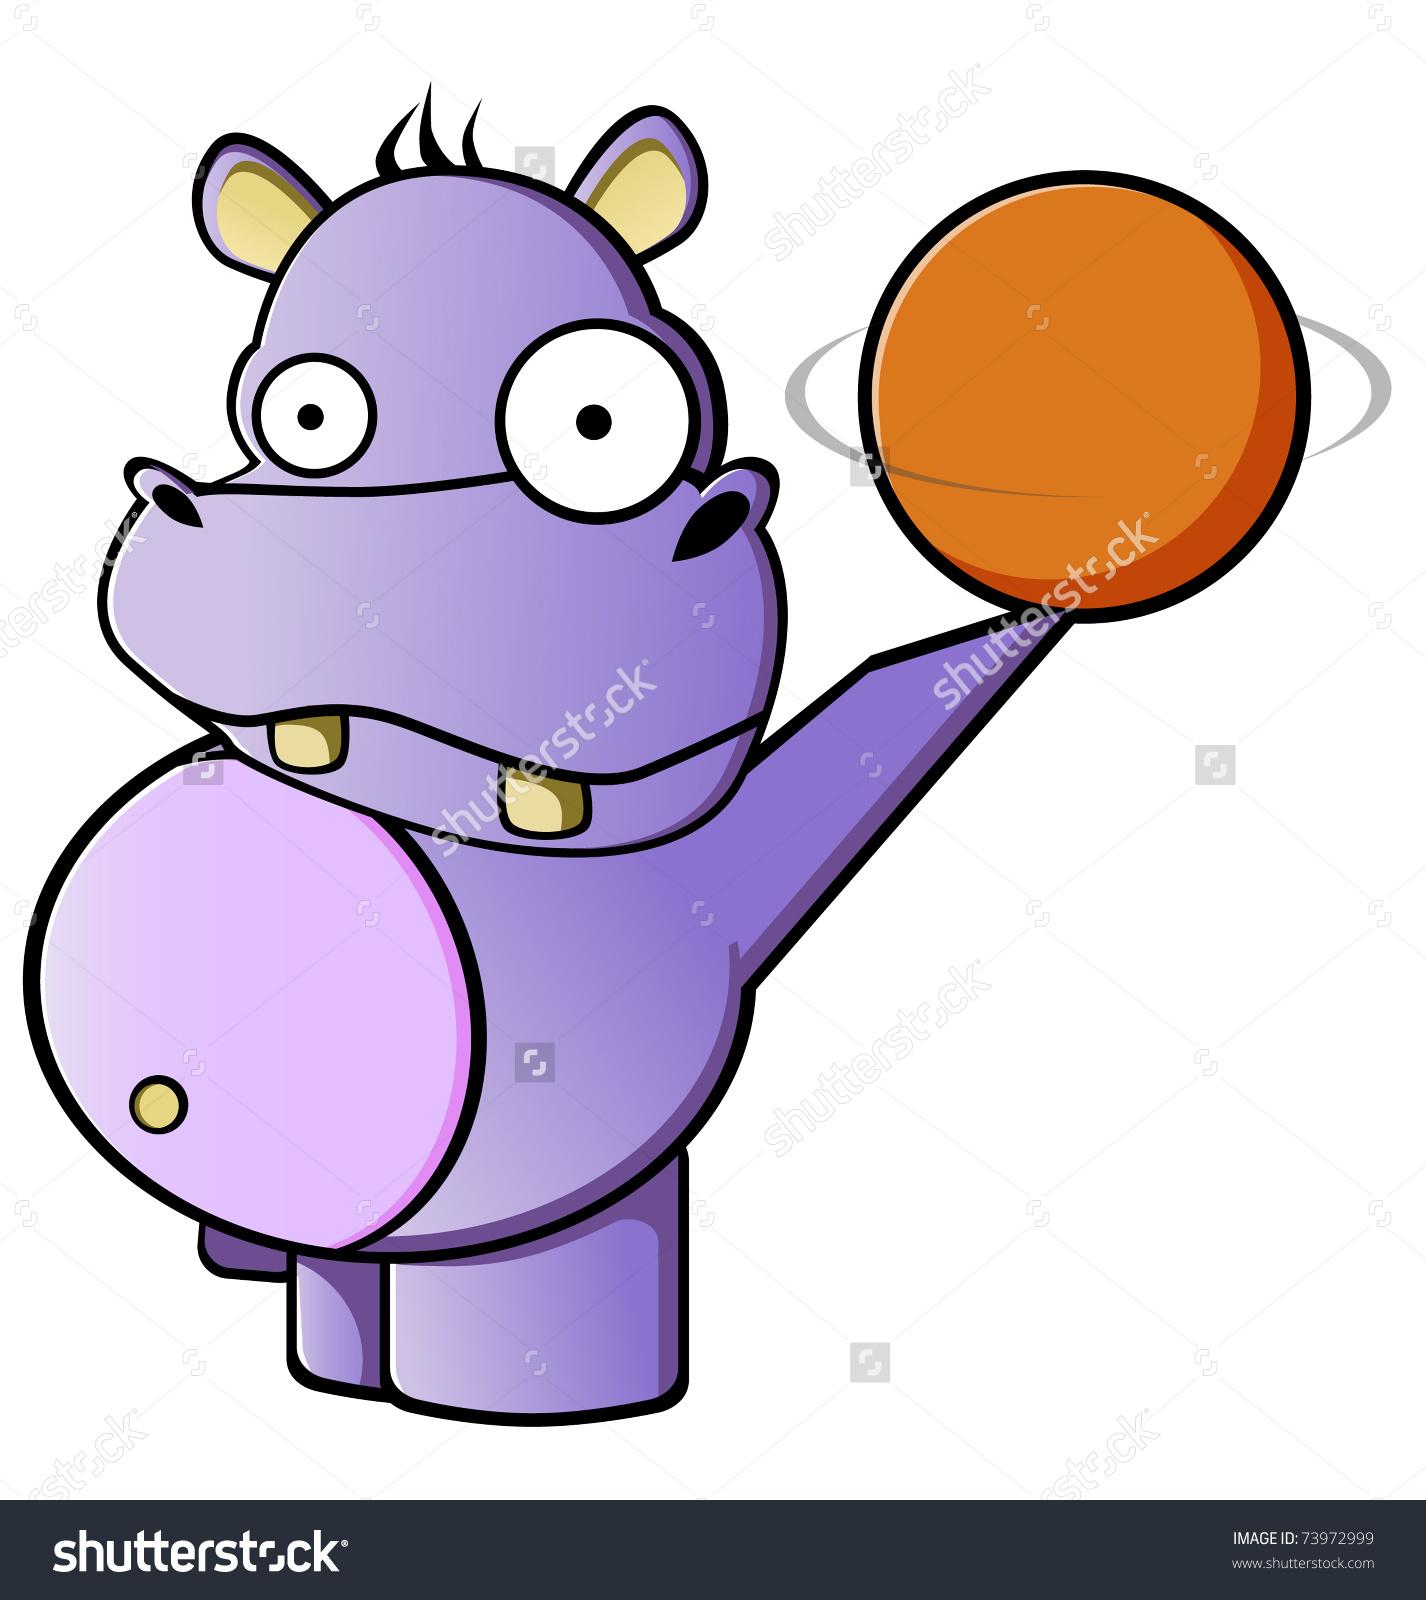 Purple Fat Hippo Rotating Ball Stock Vector 73972999.